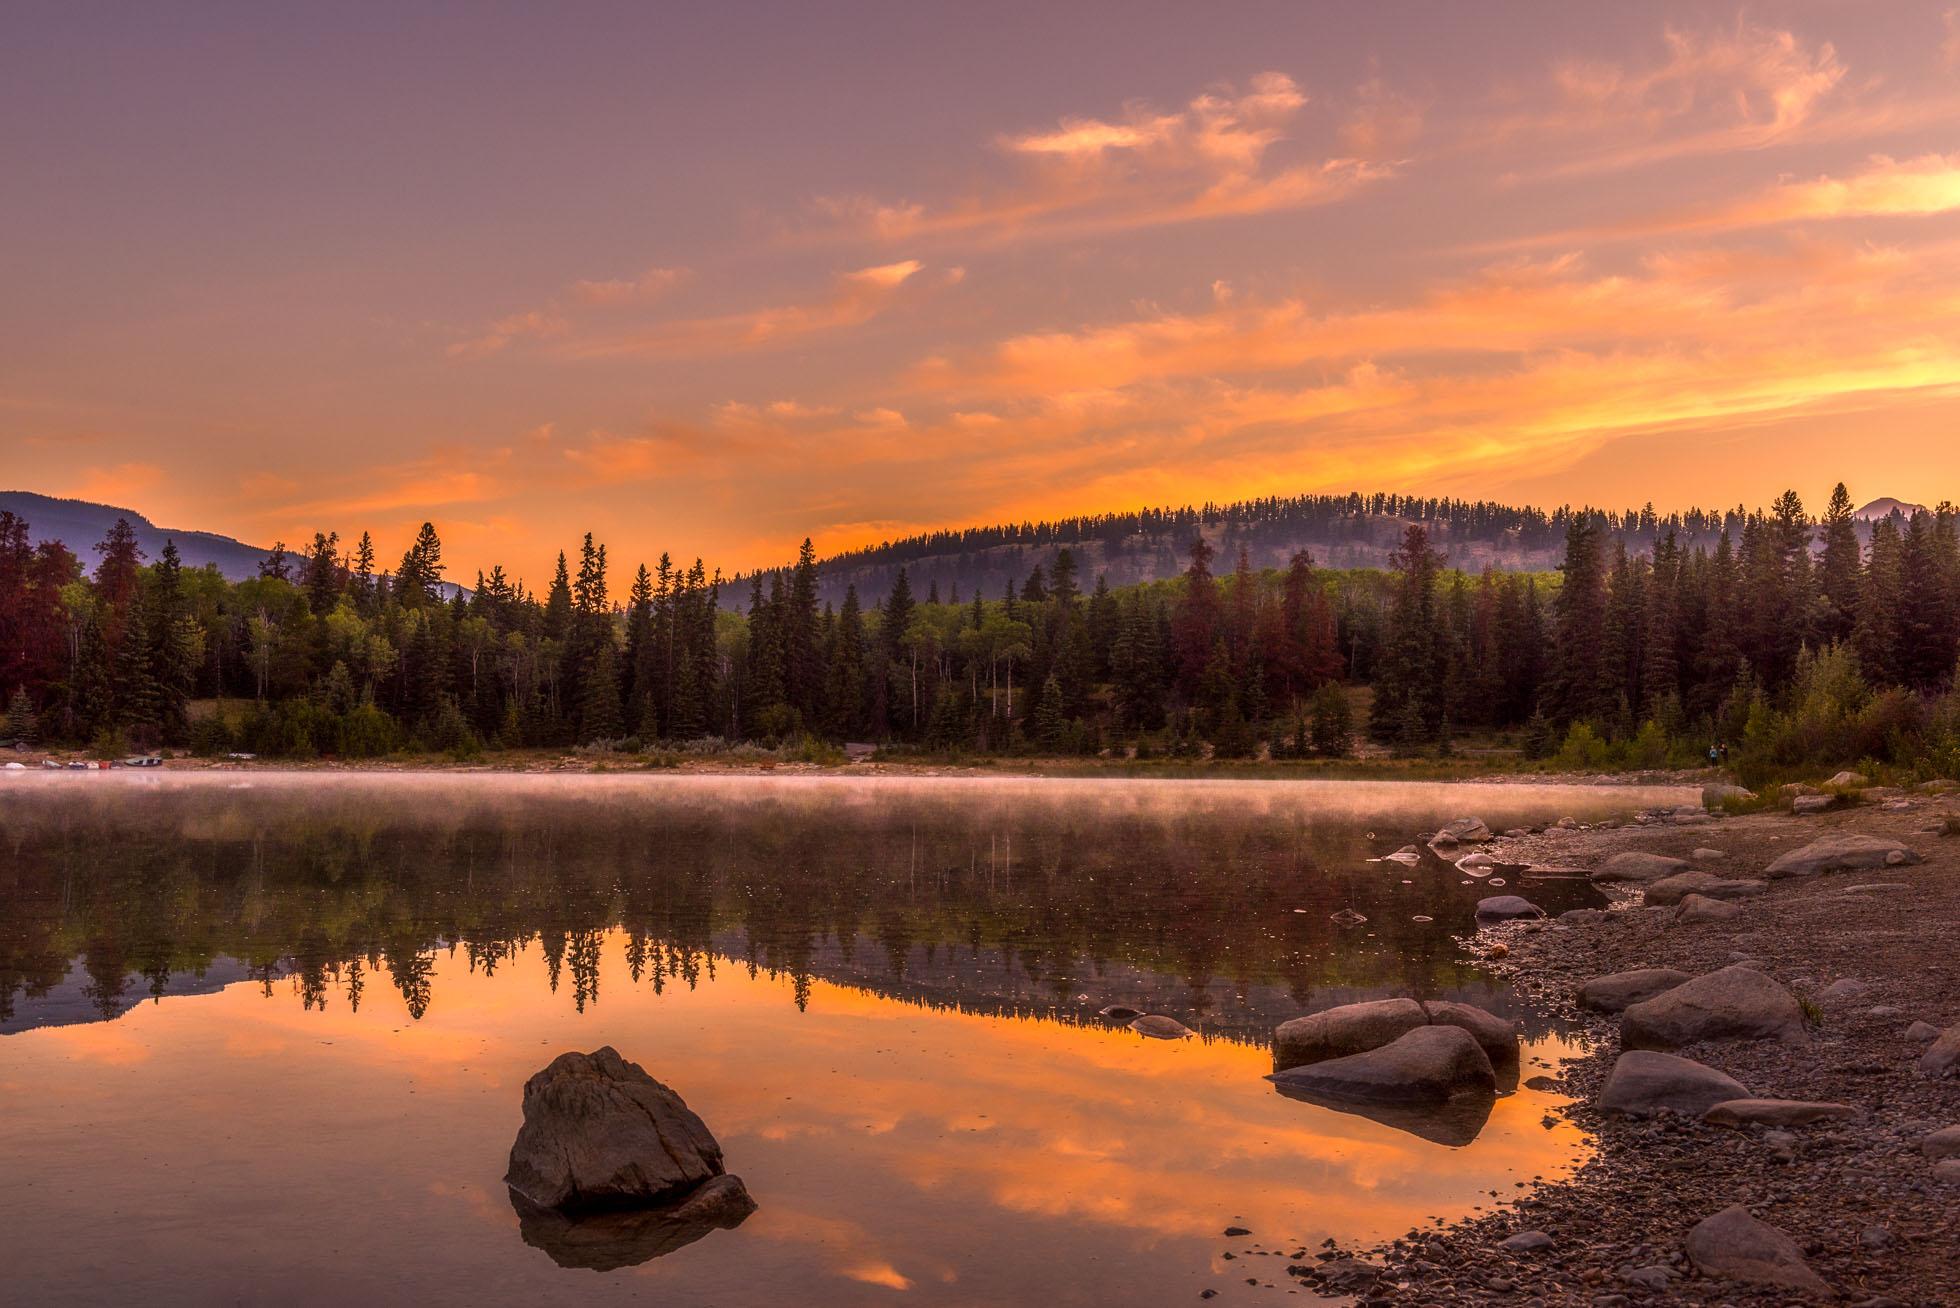 Sunrise at Patricia Lake in Jasper National Park